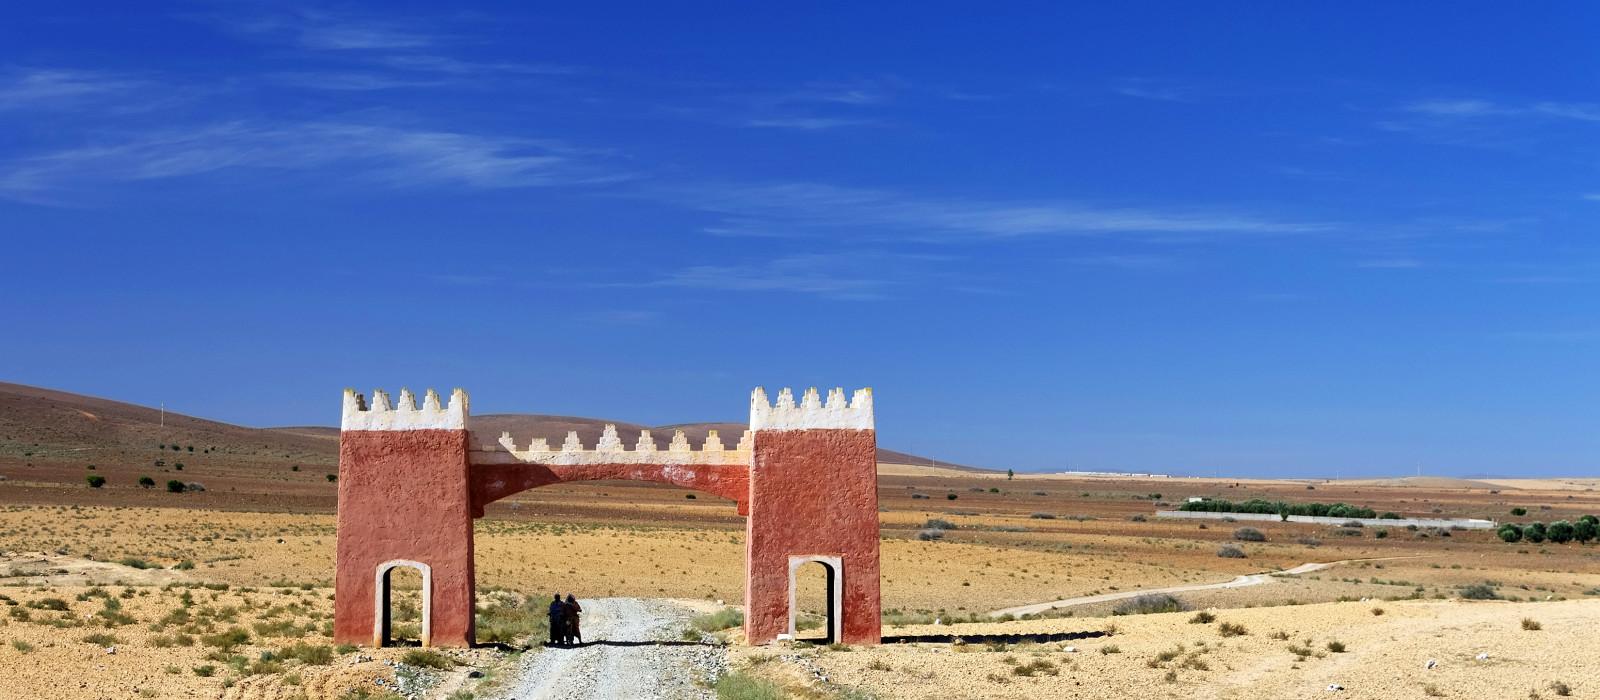 Reiseziel Tafraoute Marokko